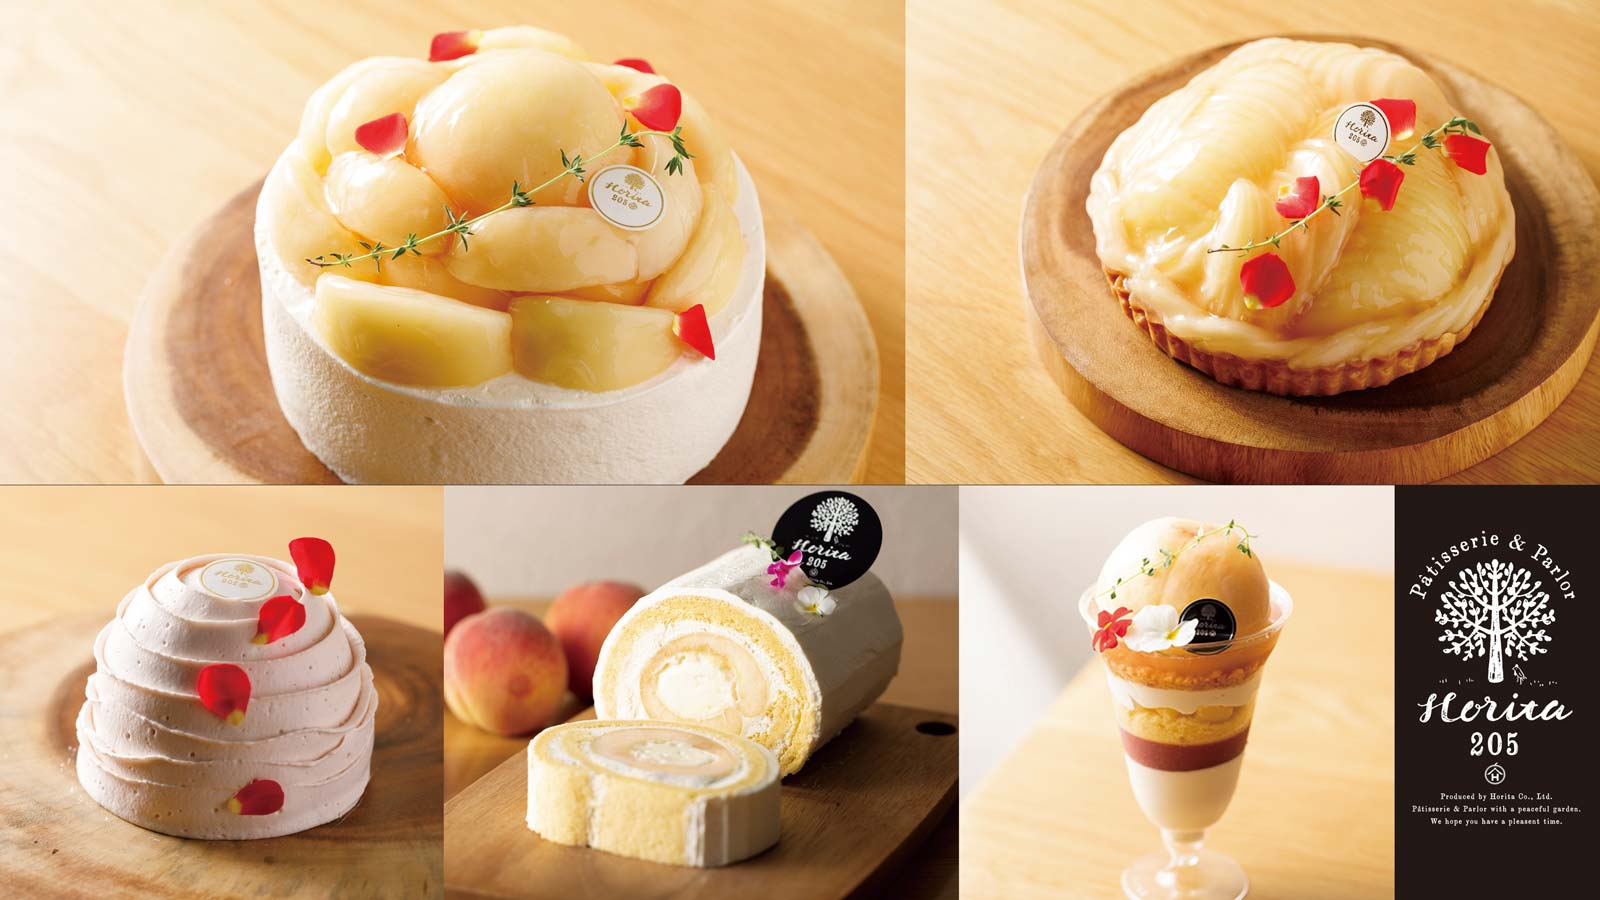 Horita205の、桃のスペシャルスイーツ